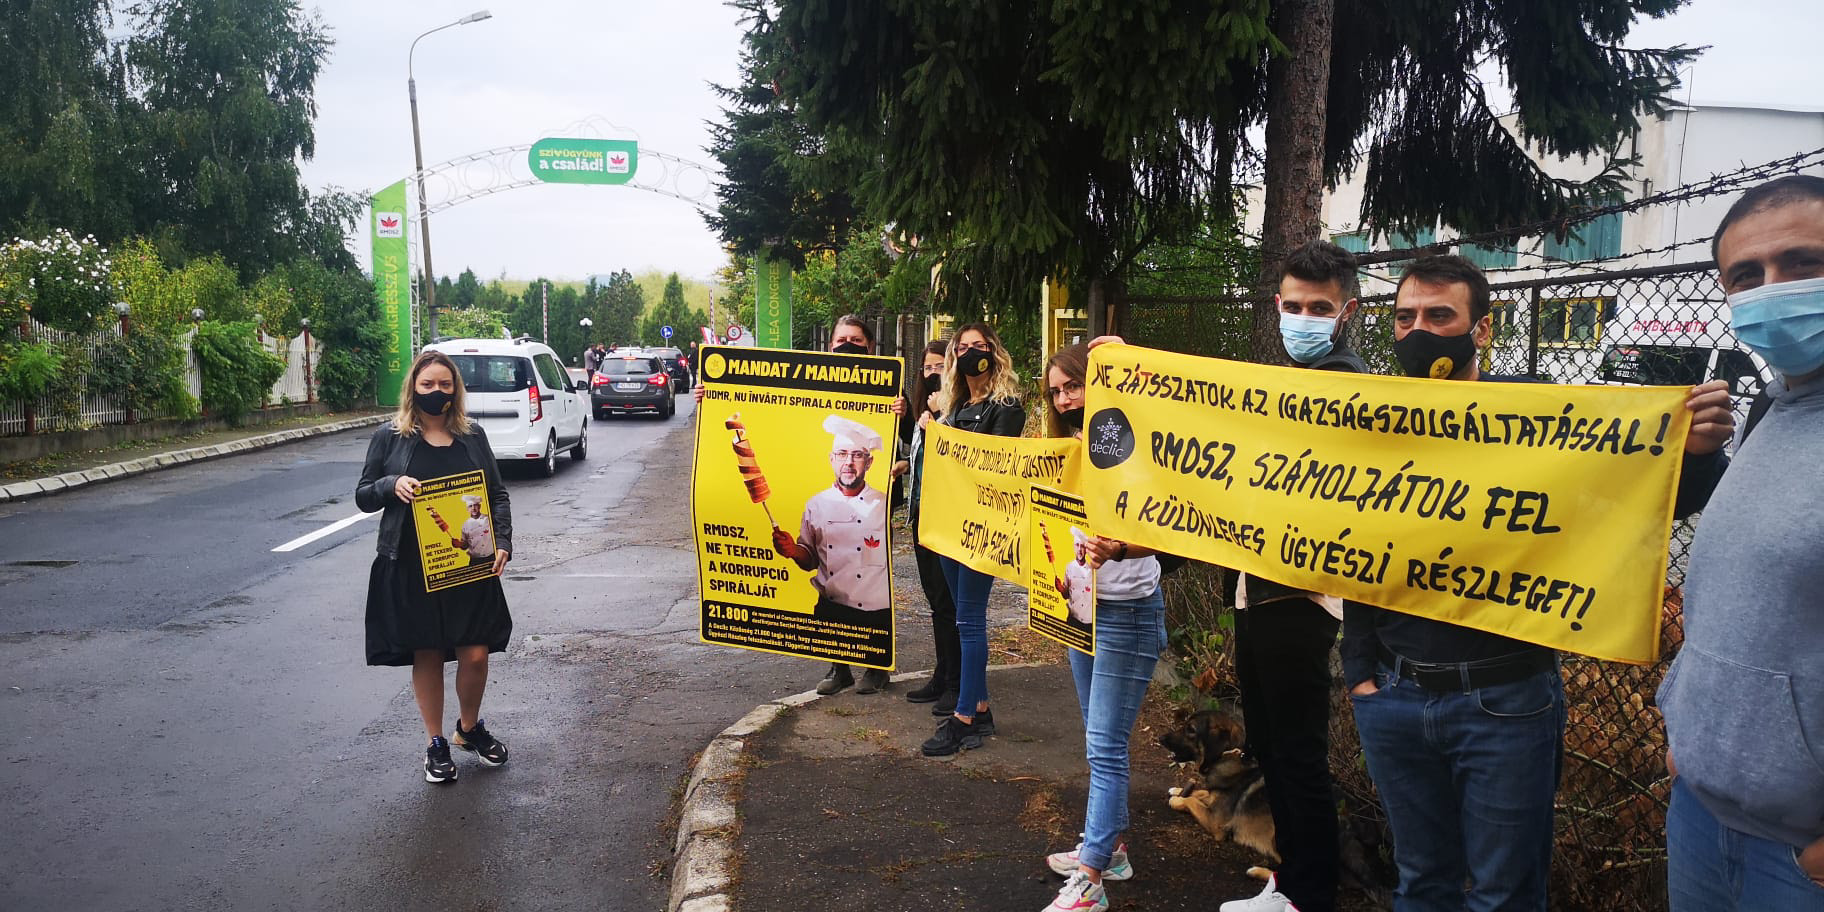 protest mandat mureș